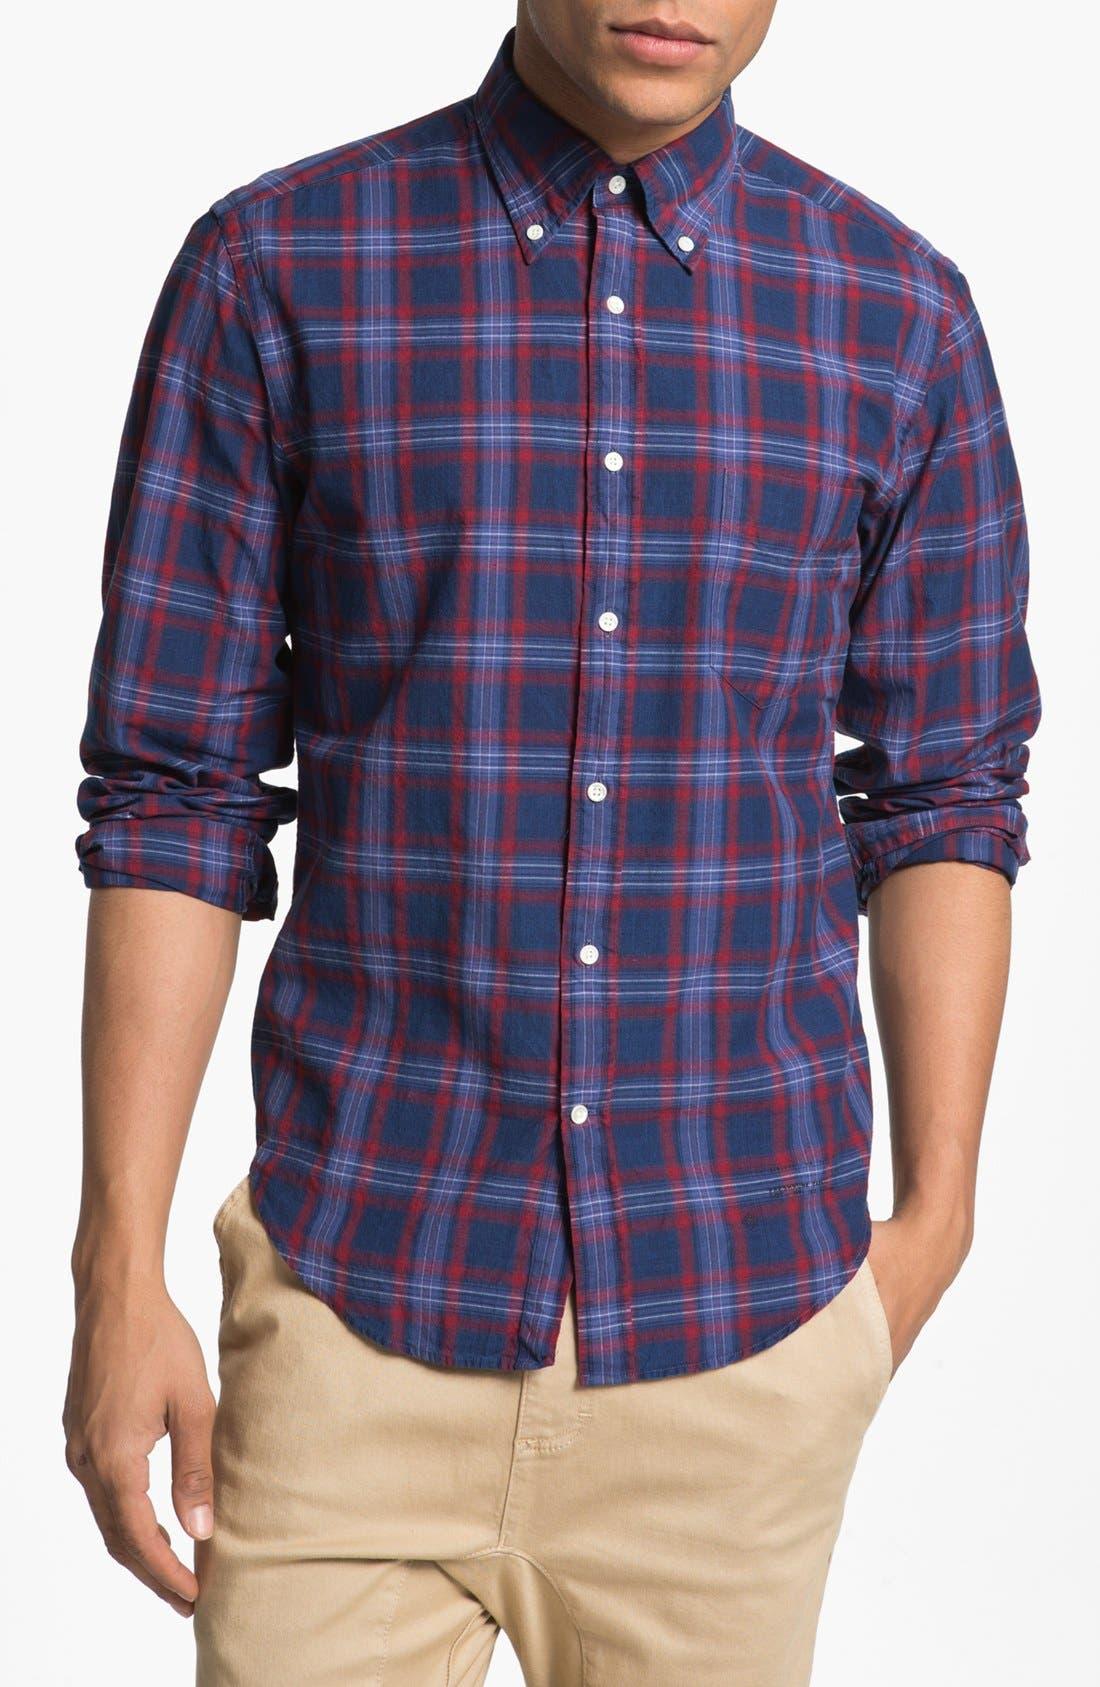 Alternate Image 1 Selected - Gant Rugger Check Plaid Shirt